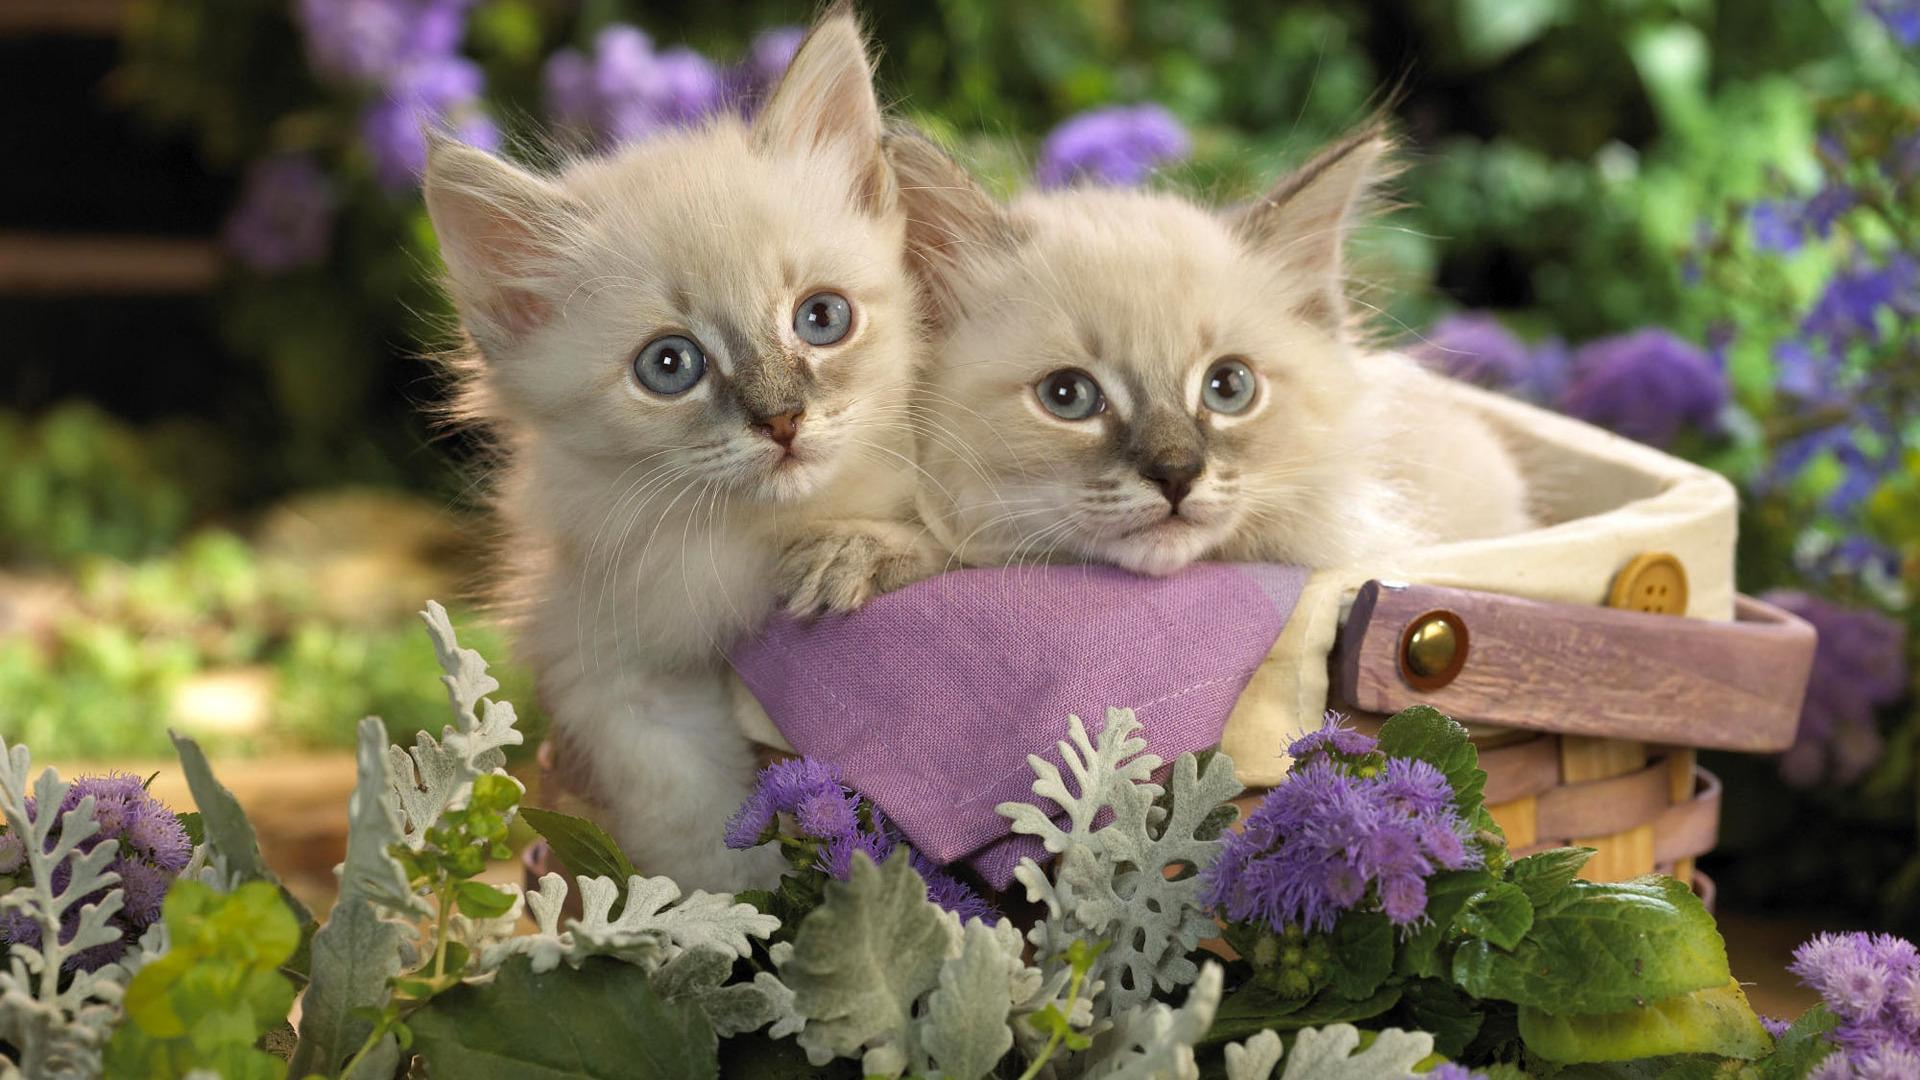 Cute Pets Wallpaper 20731 1920x1200 px